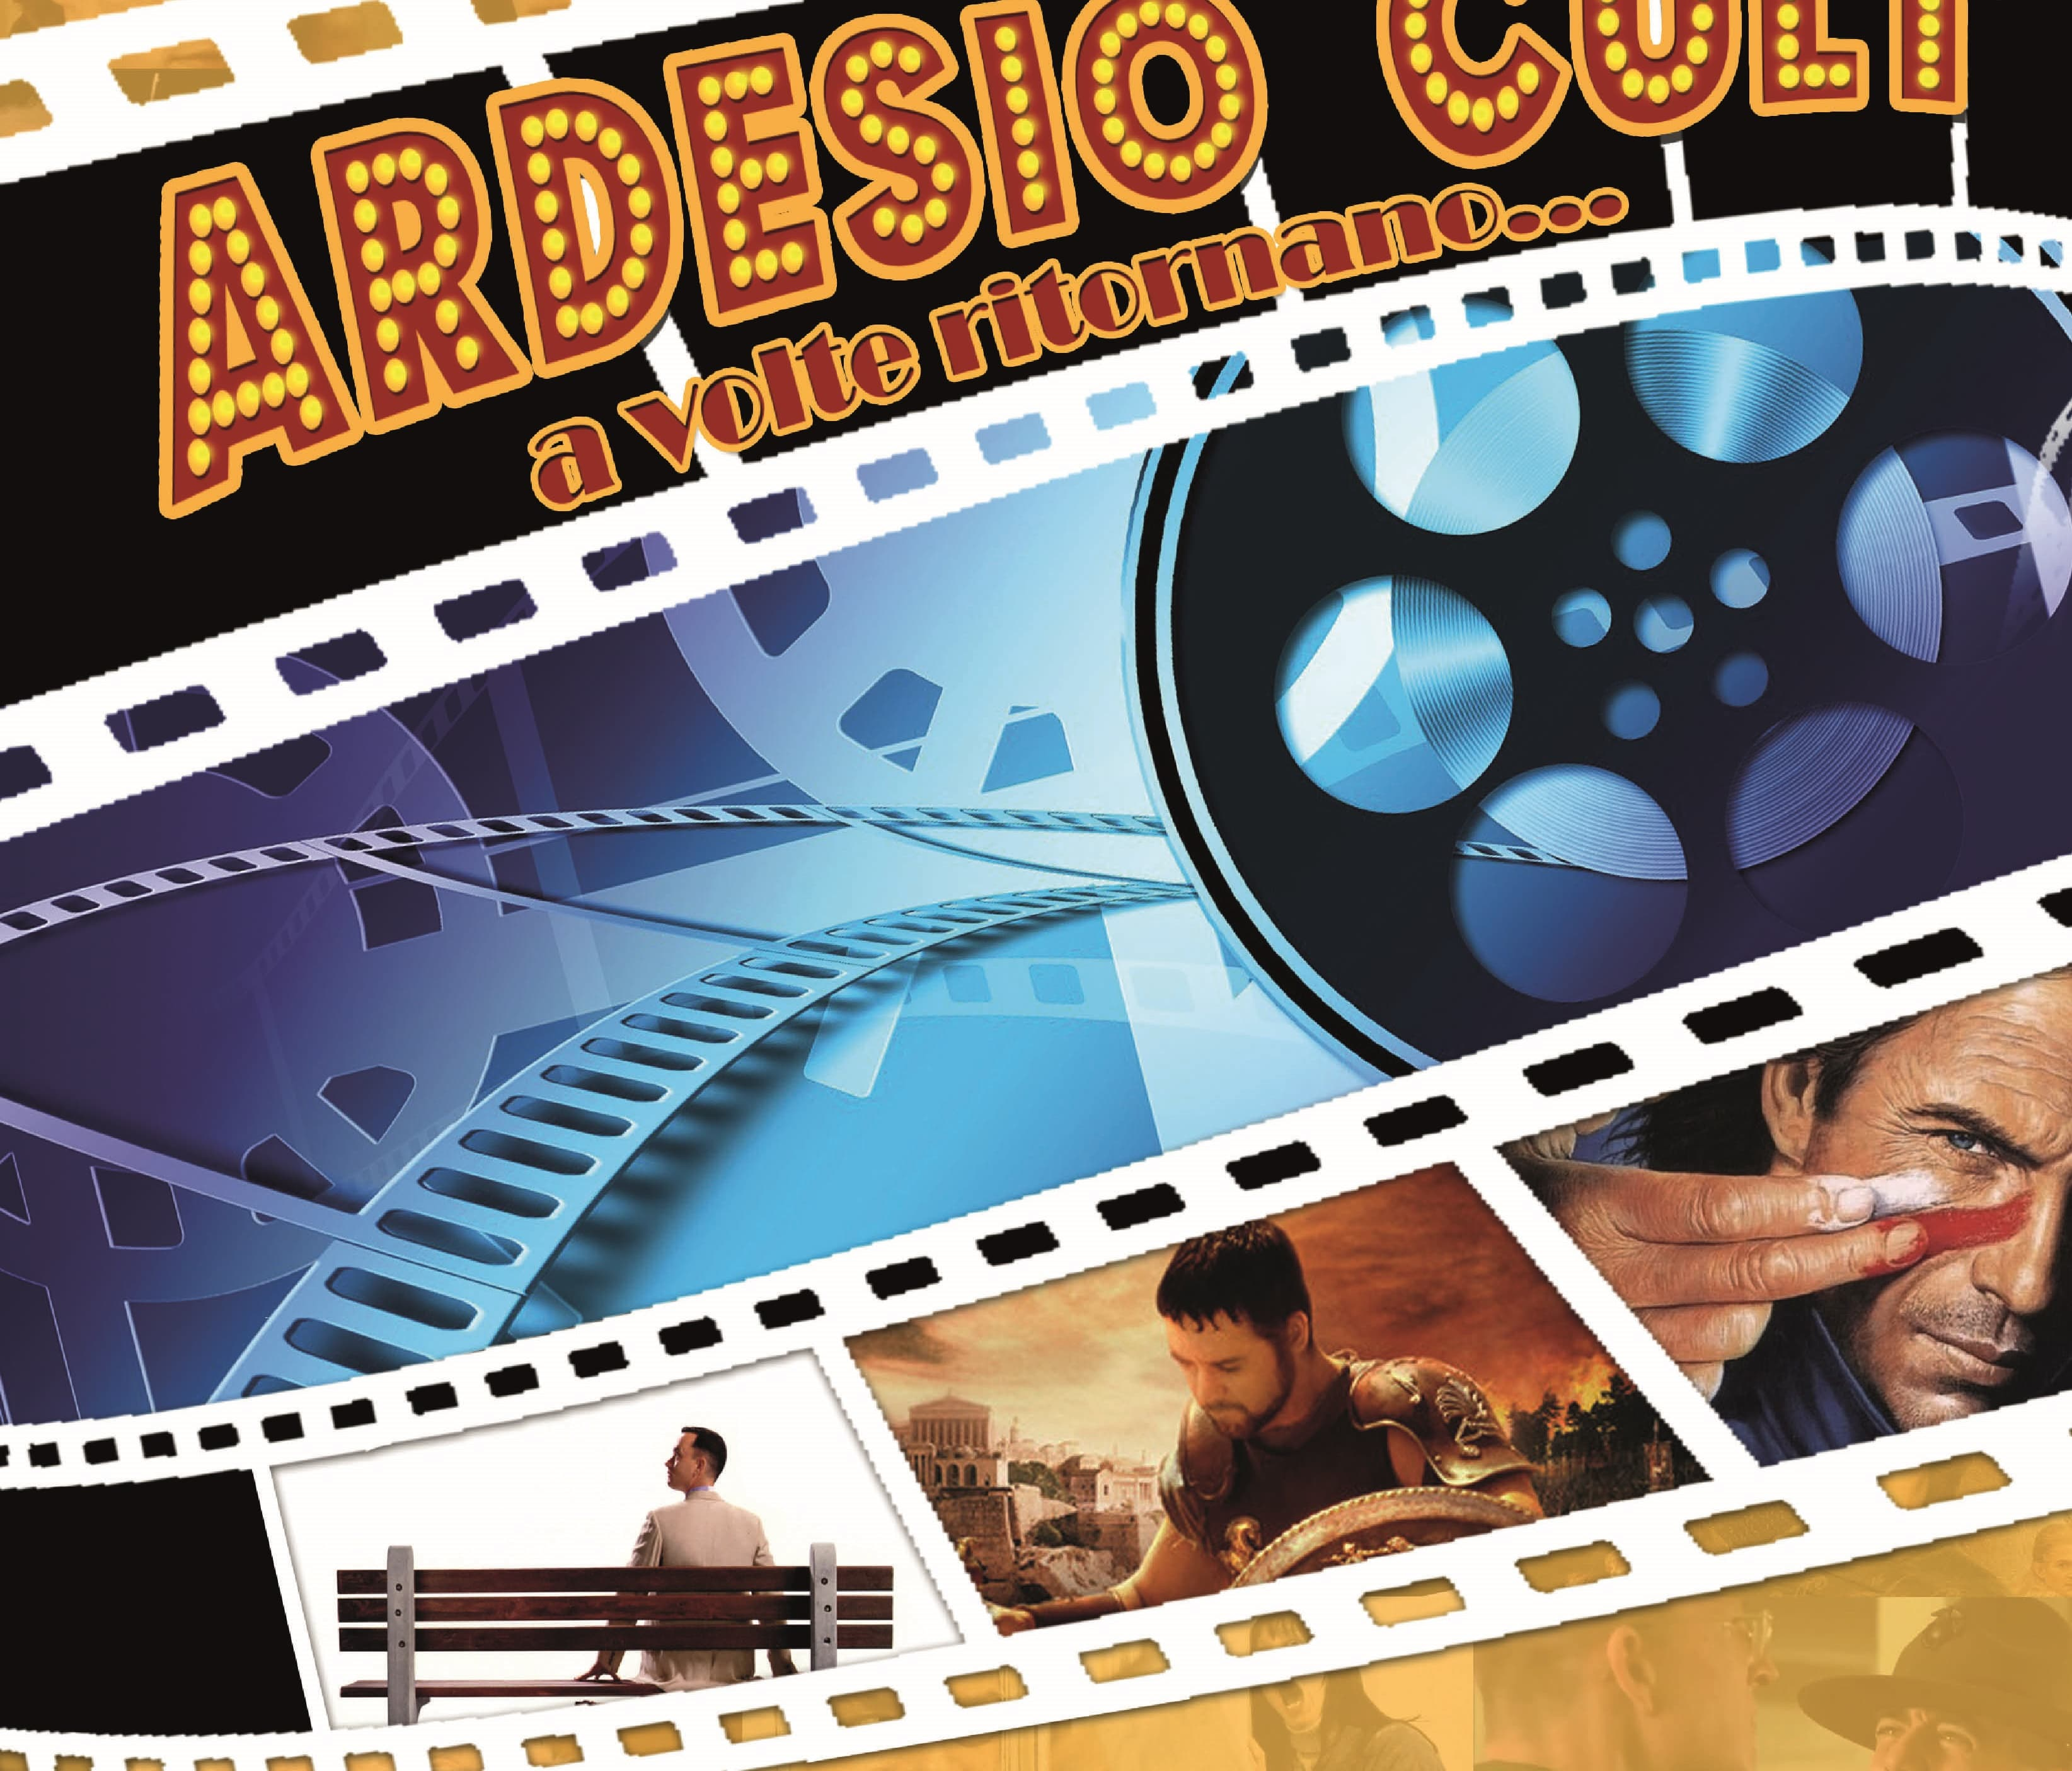 Rassegna Cinematografica Ardesio Cult